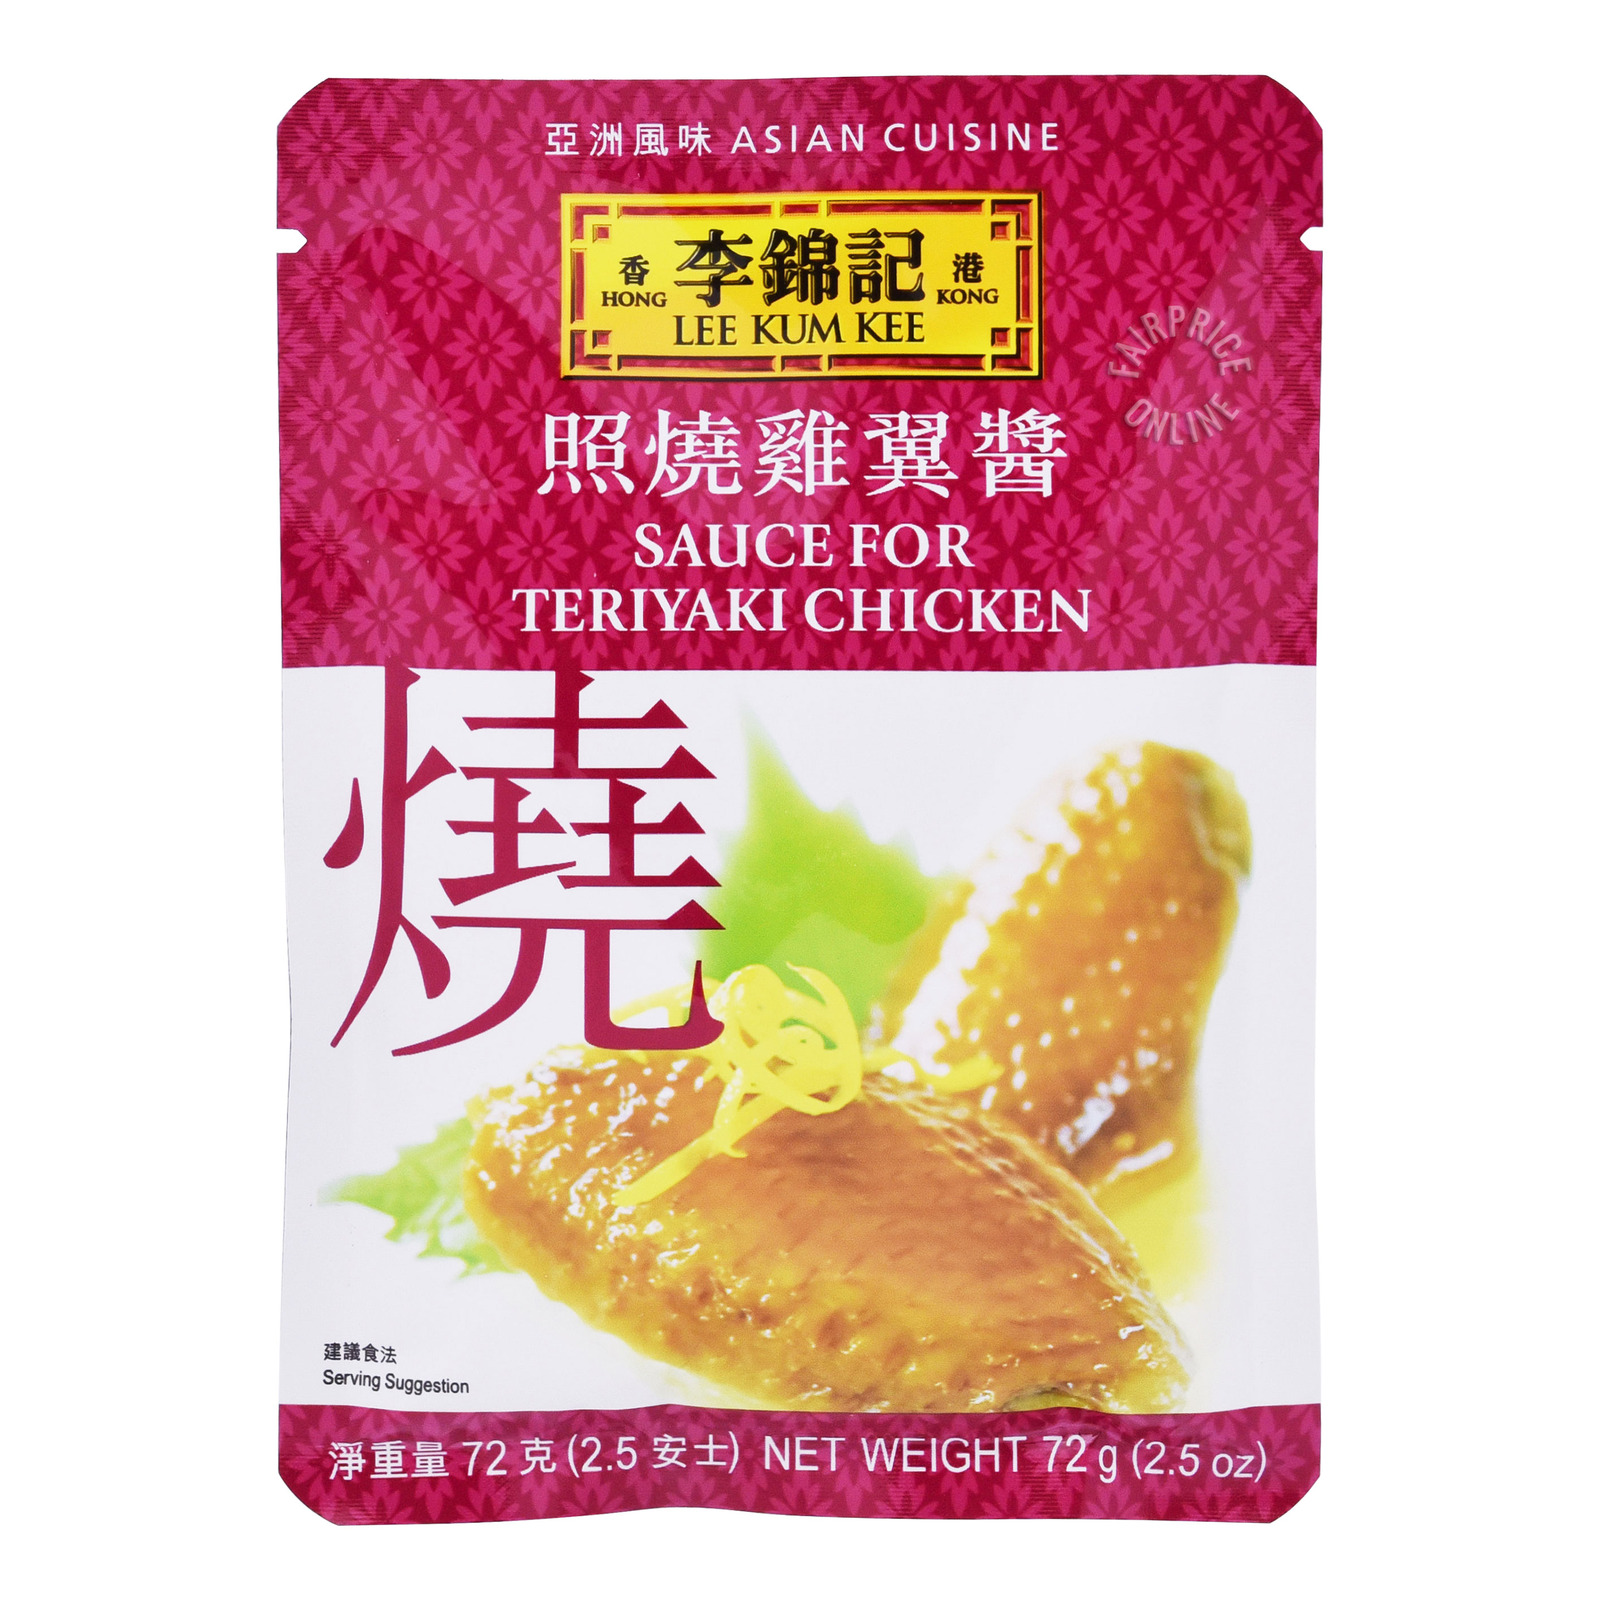 Lee Kum Kee Sauce - Teriyaki Chicken